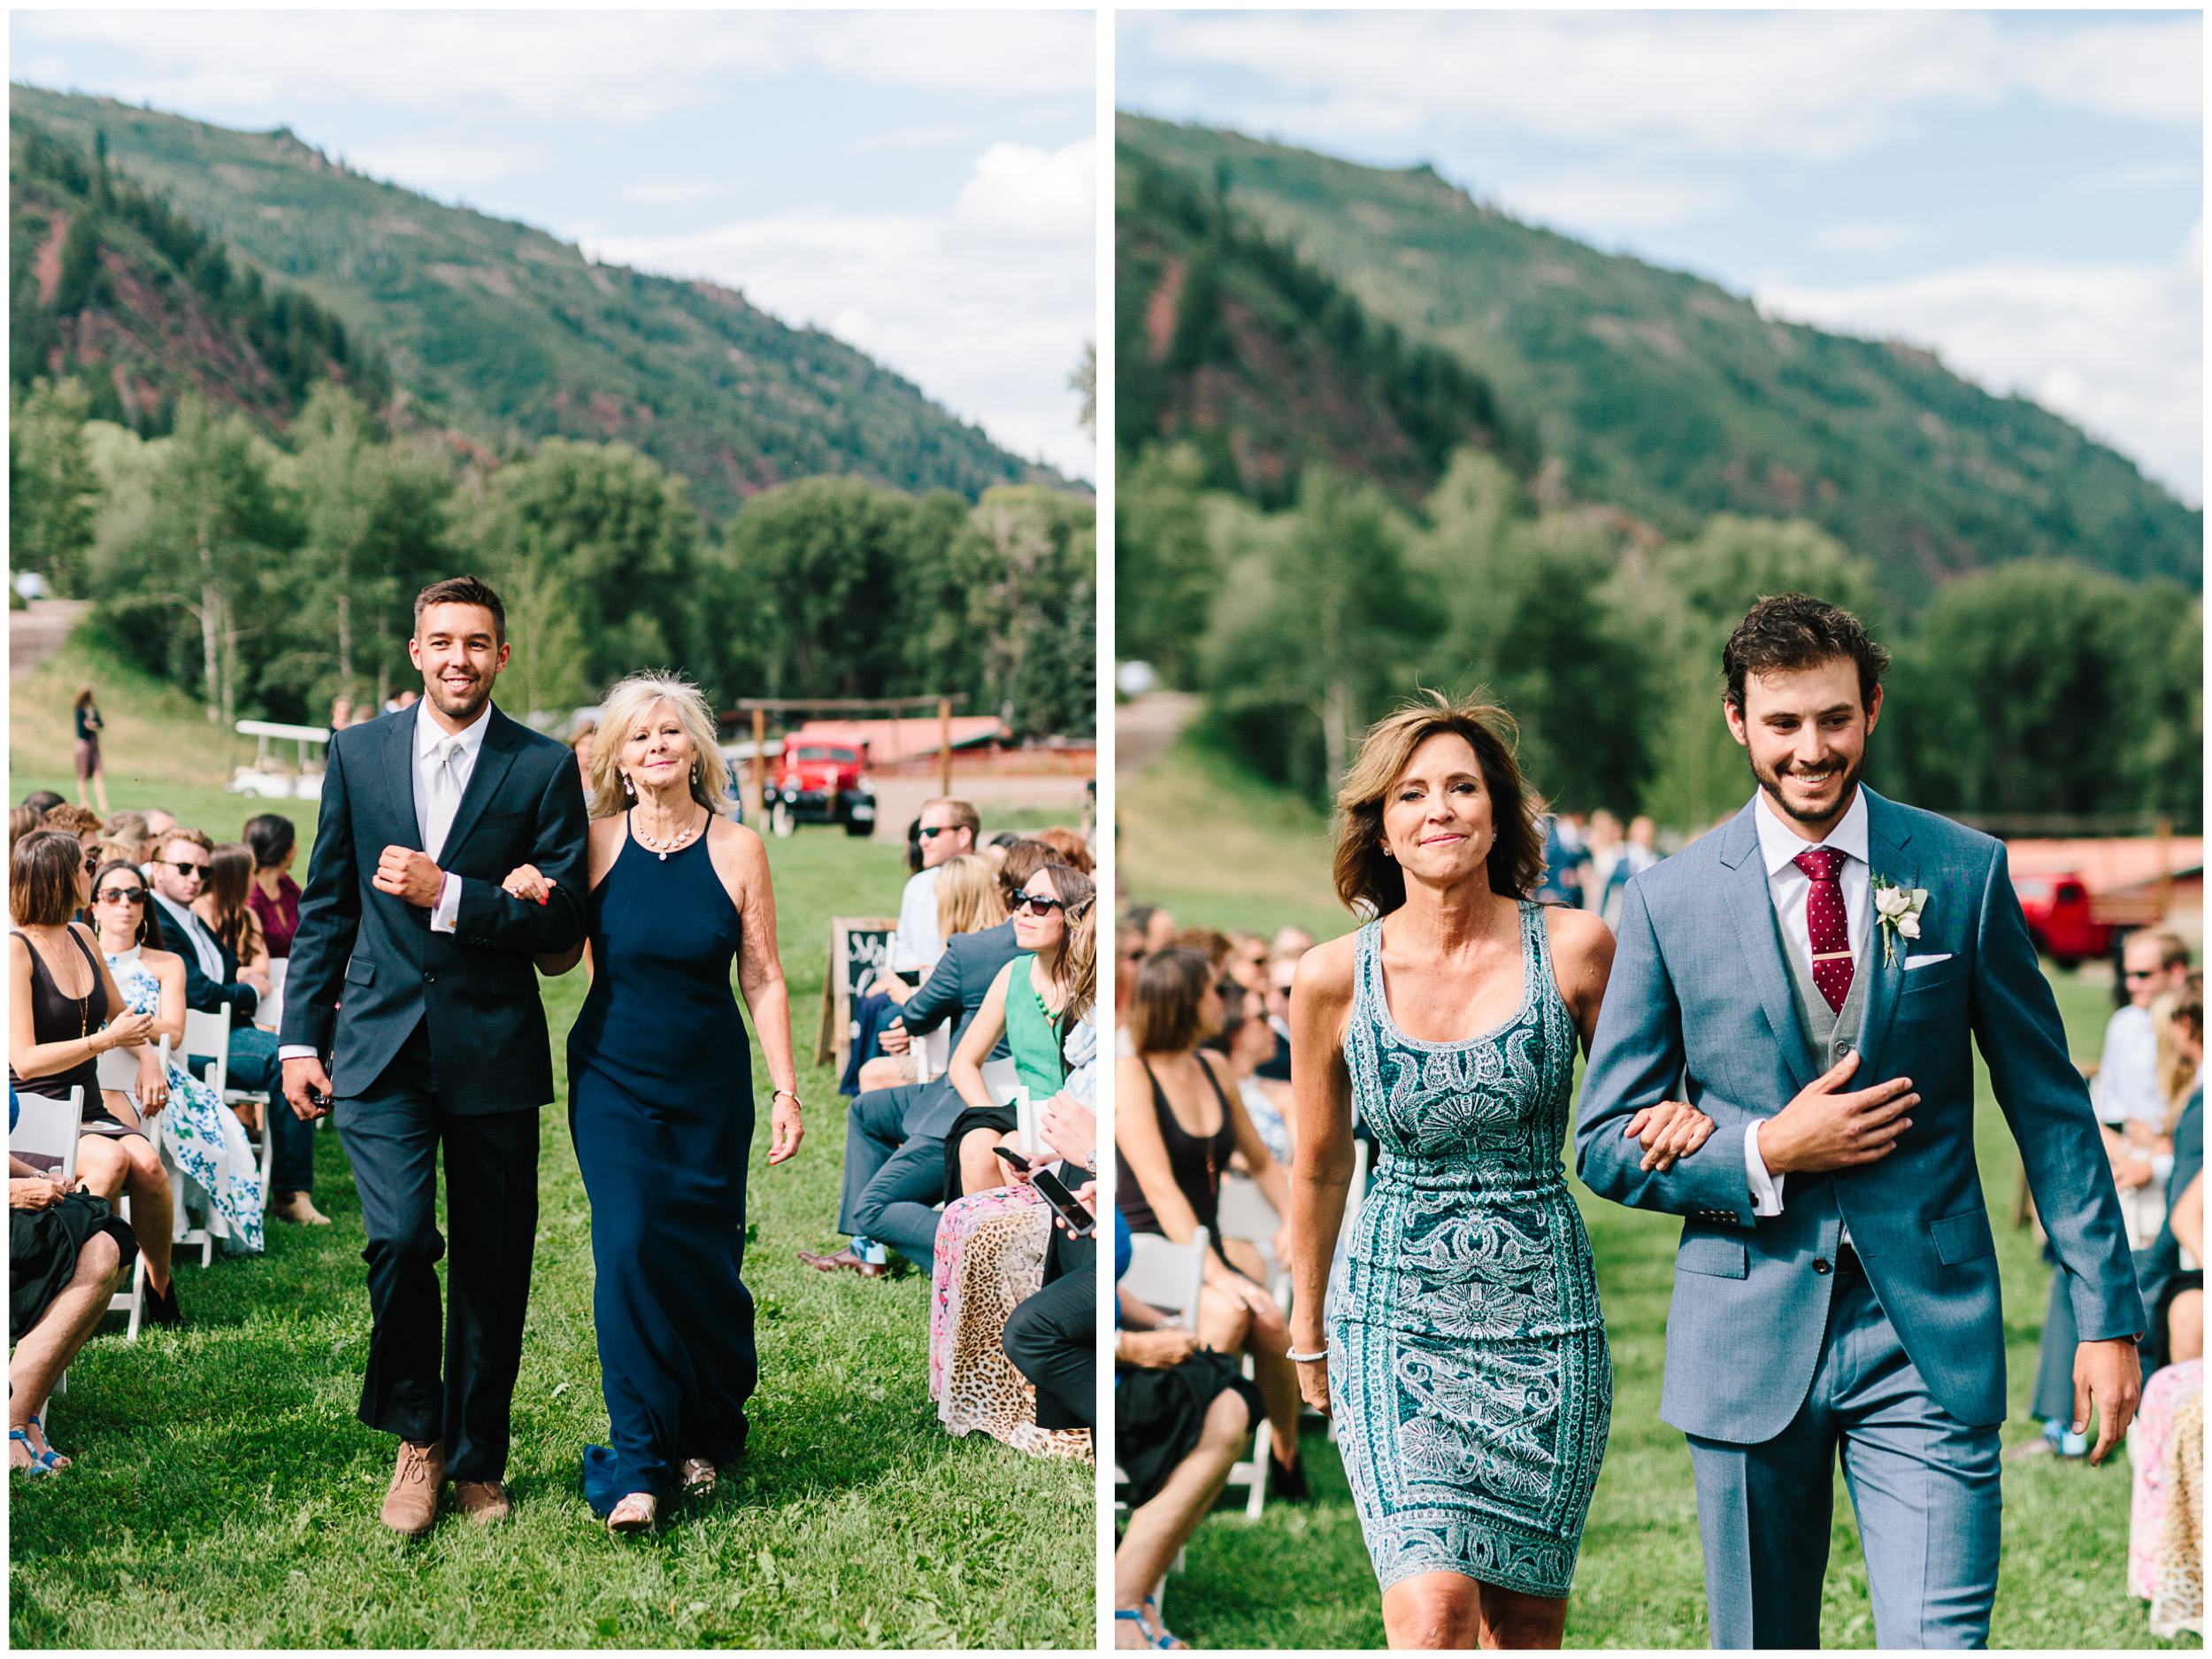 aspen_wedding_29.jpg